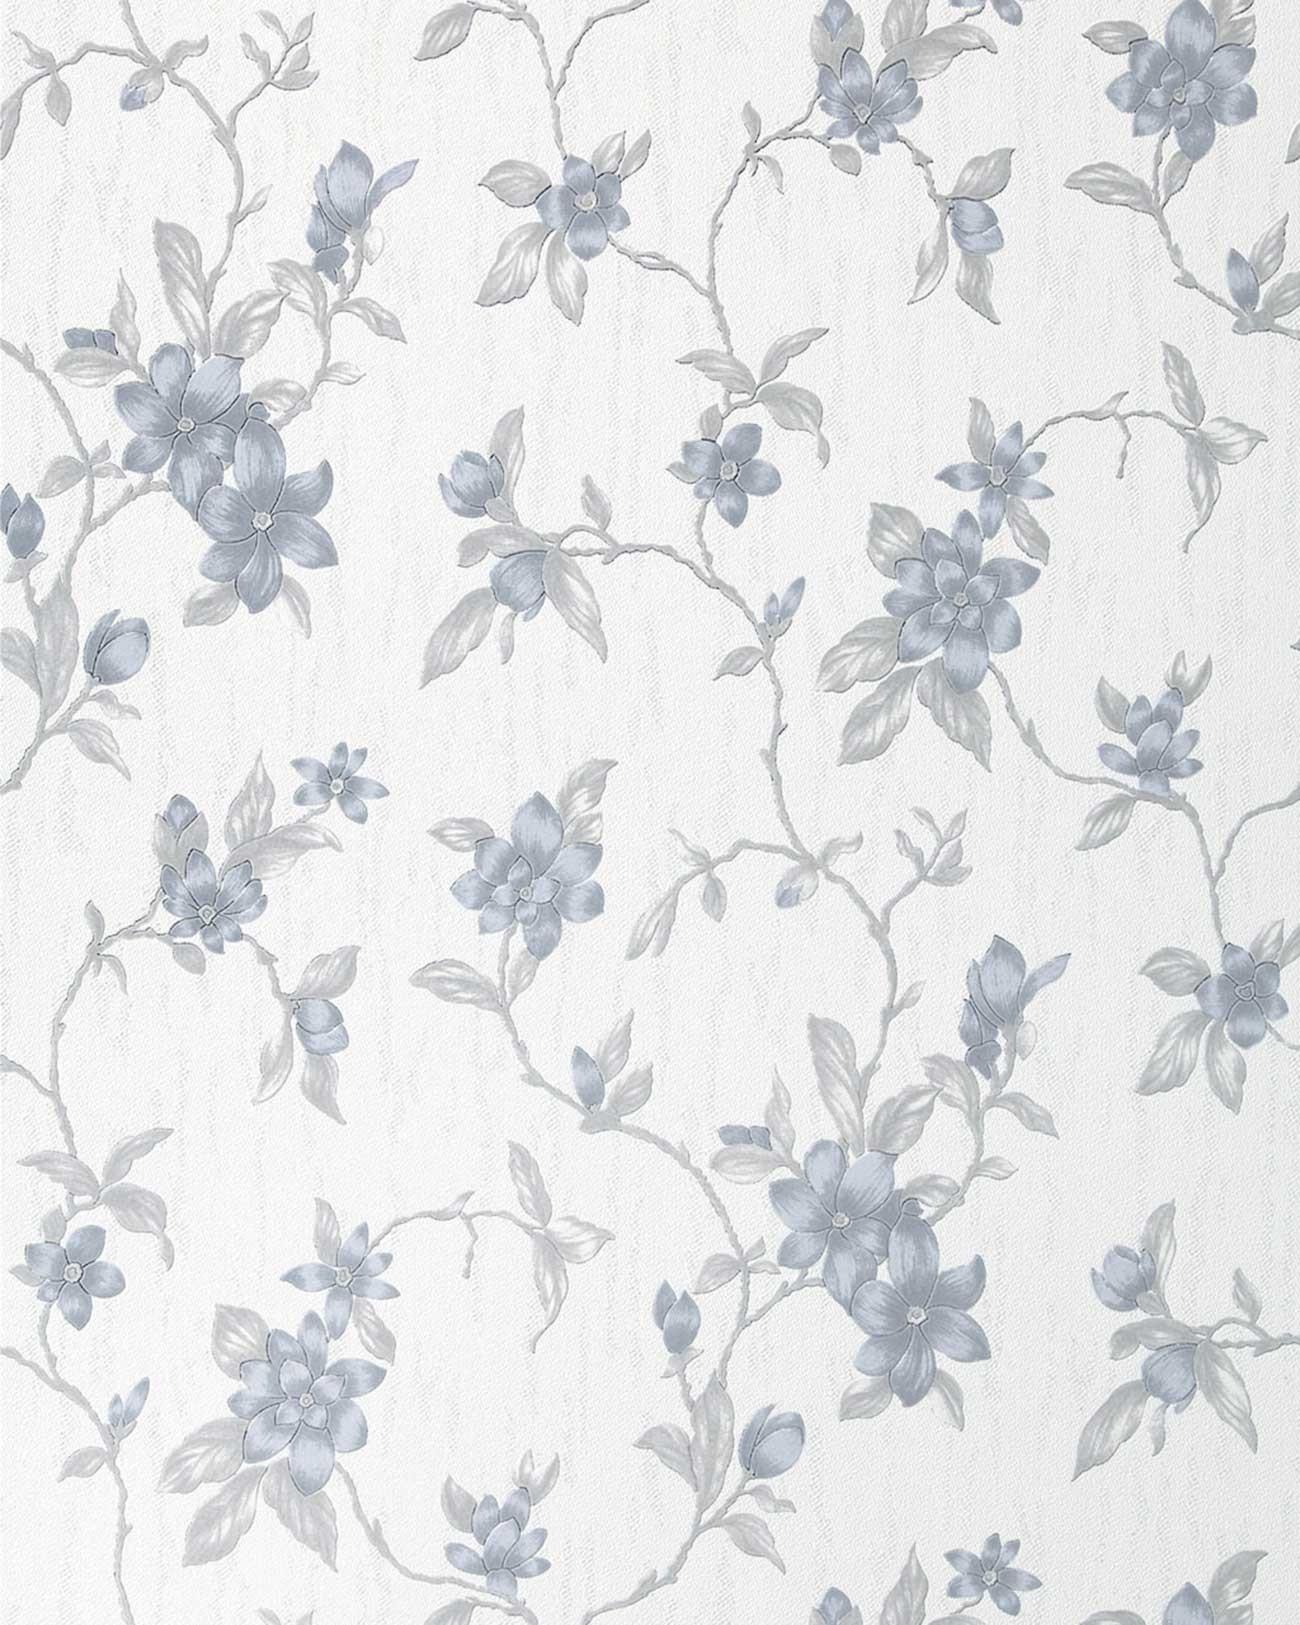 Edem 032 20 tapete floral design blumen natur wei petrol for Tapete petrol grau